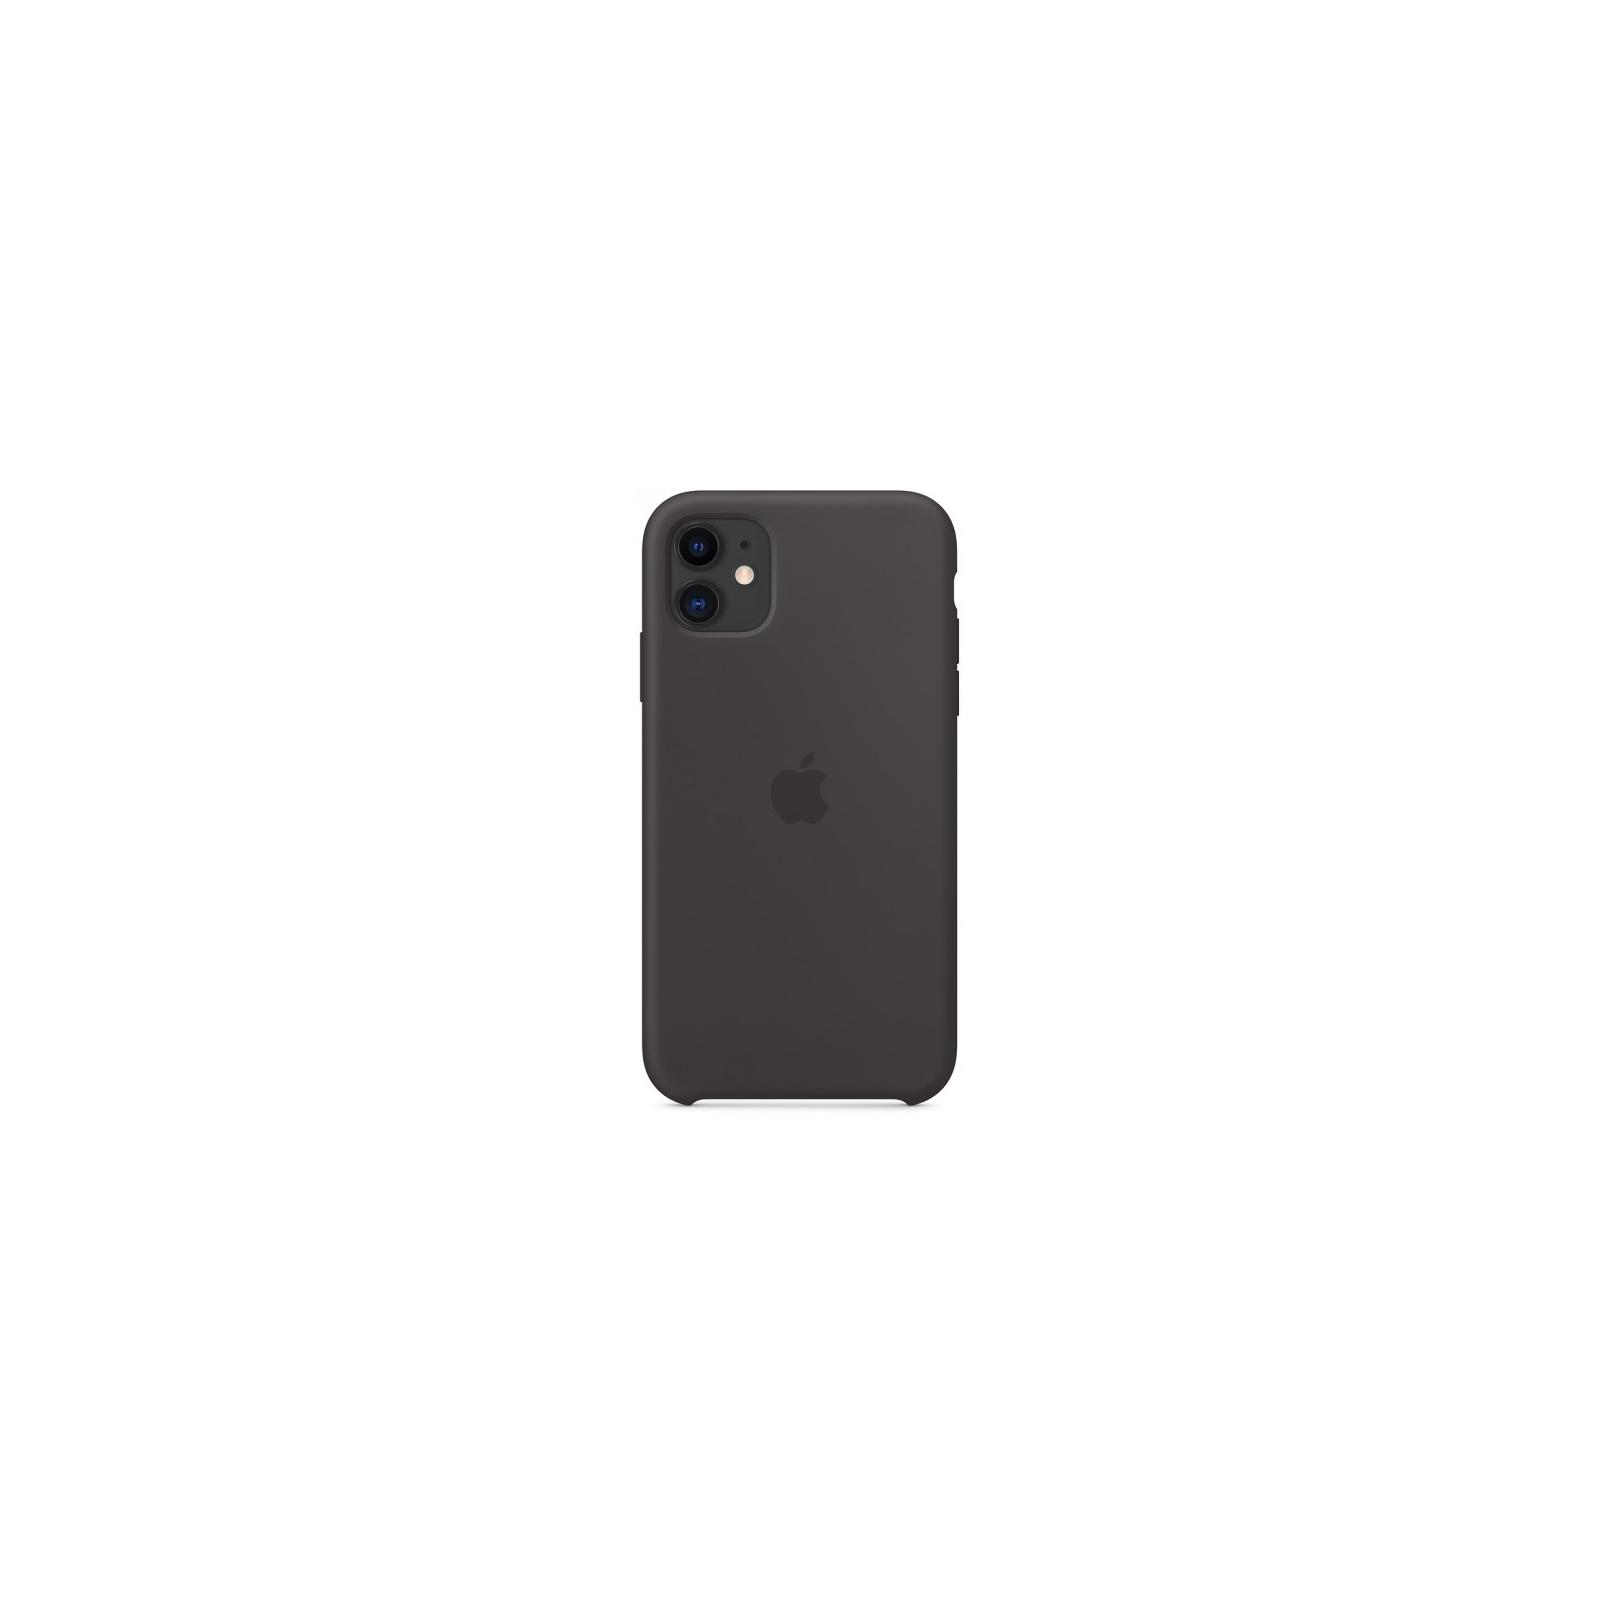 Чехол для моб. телефона Apple iPhone 11 Silicone Case - Black (MWVU2ZM/A) изображение 2